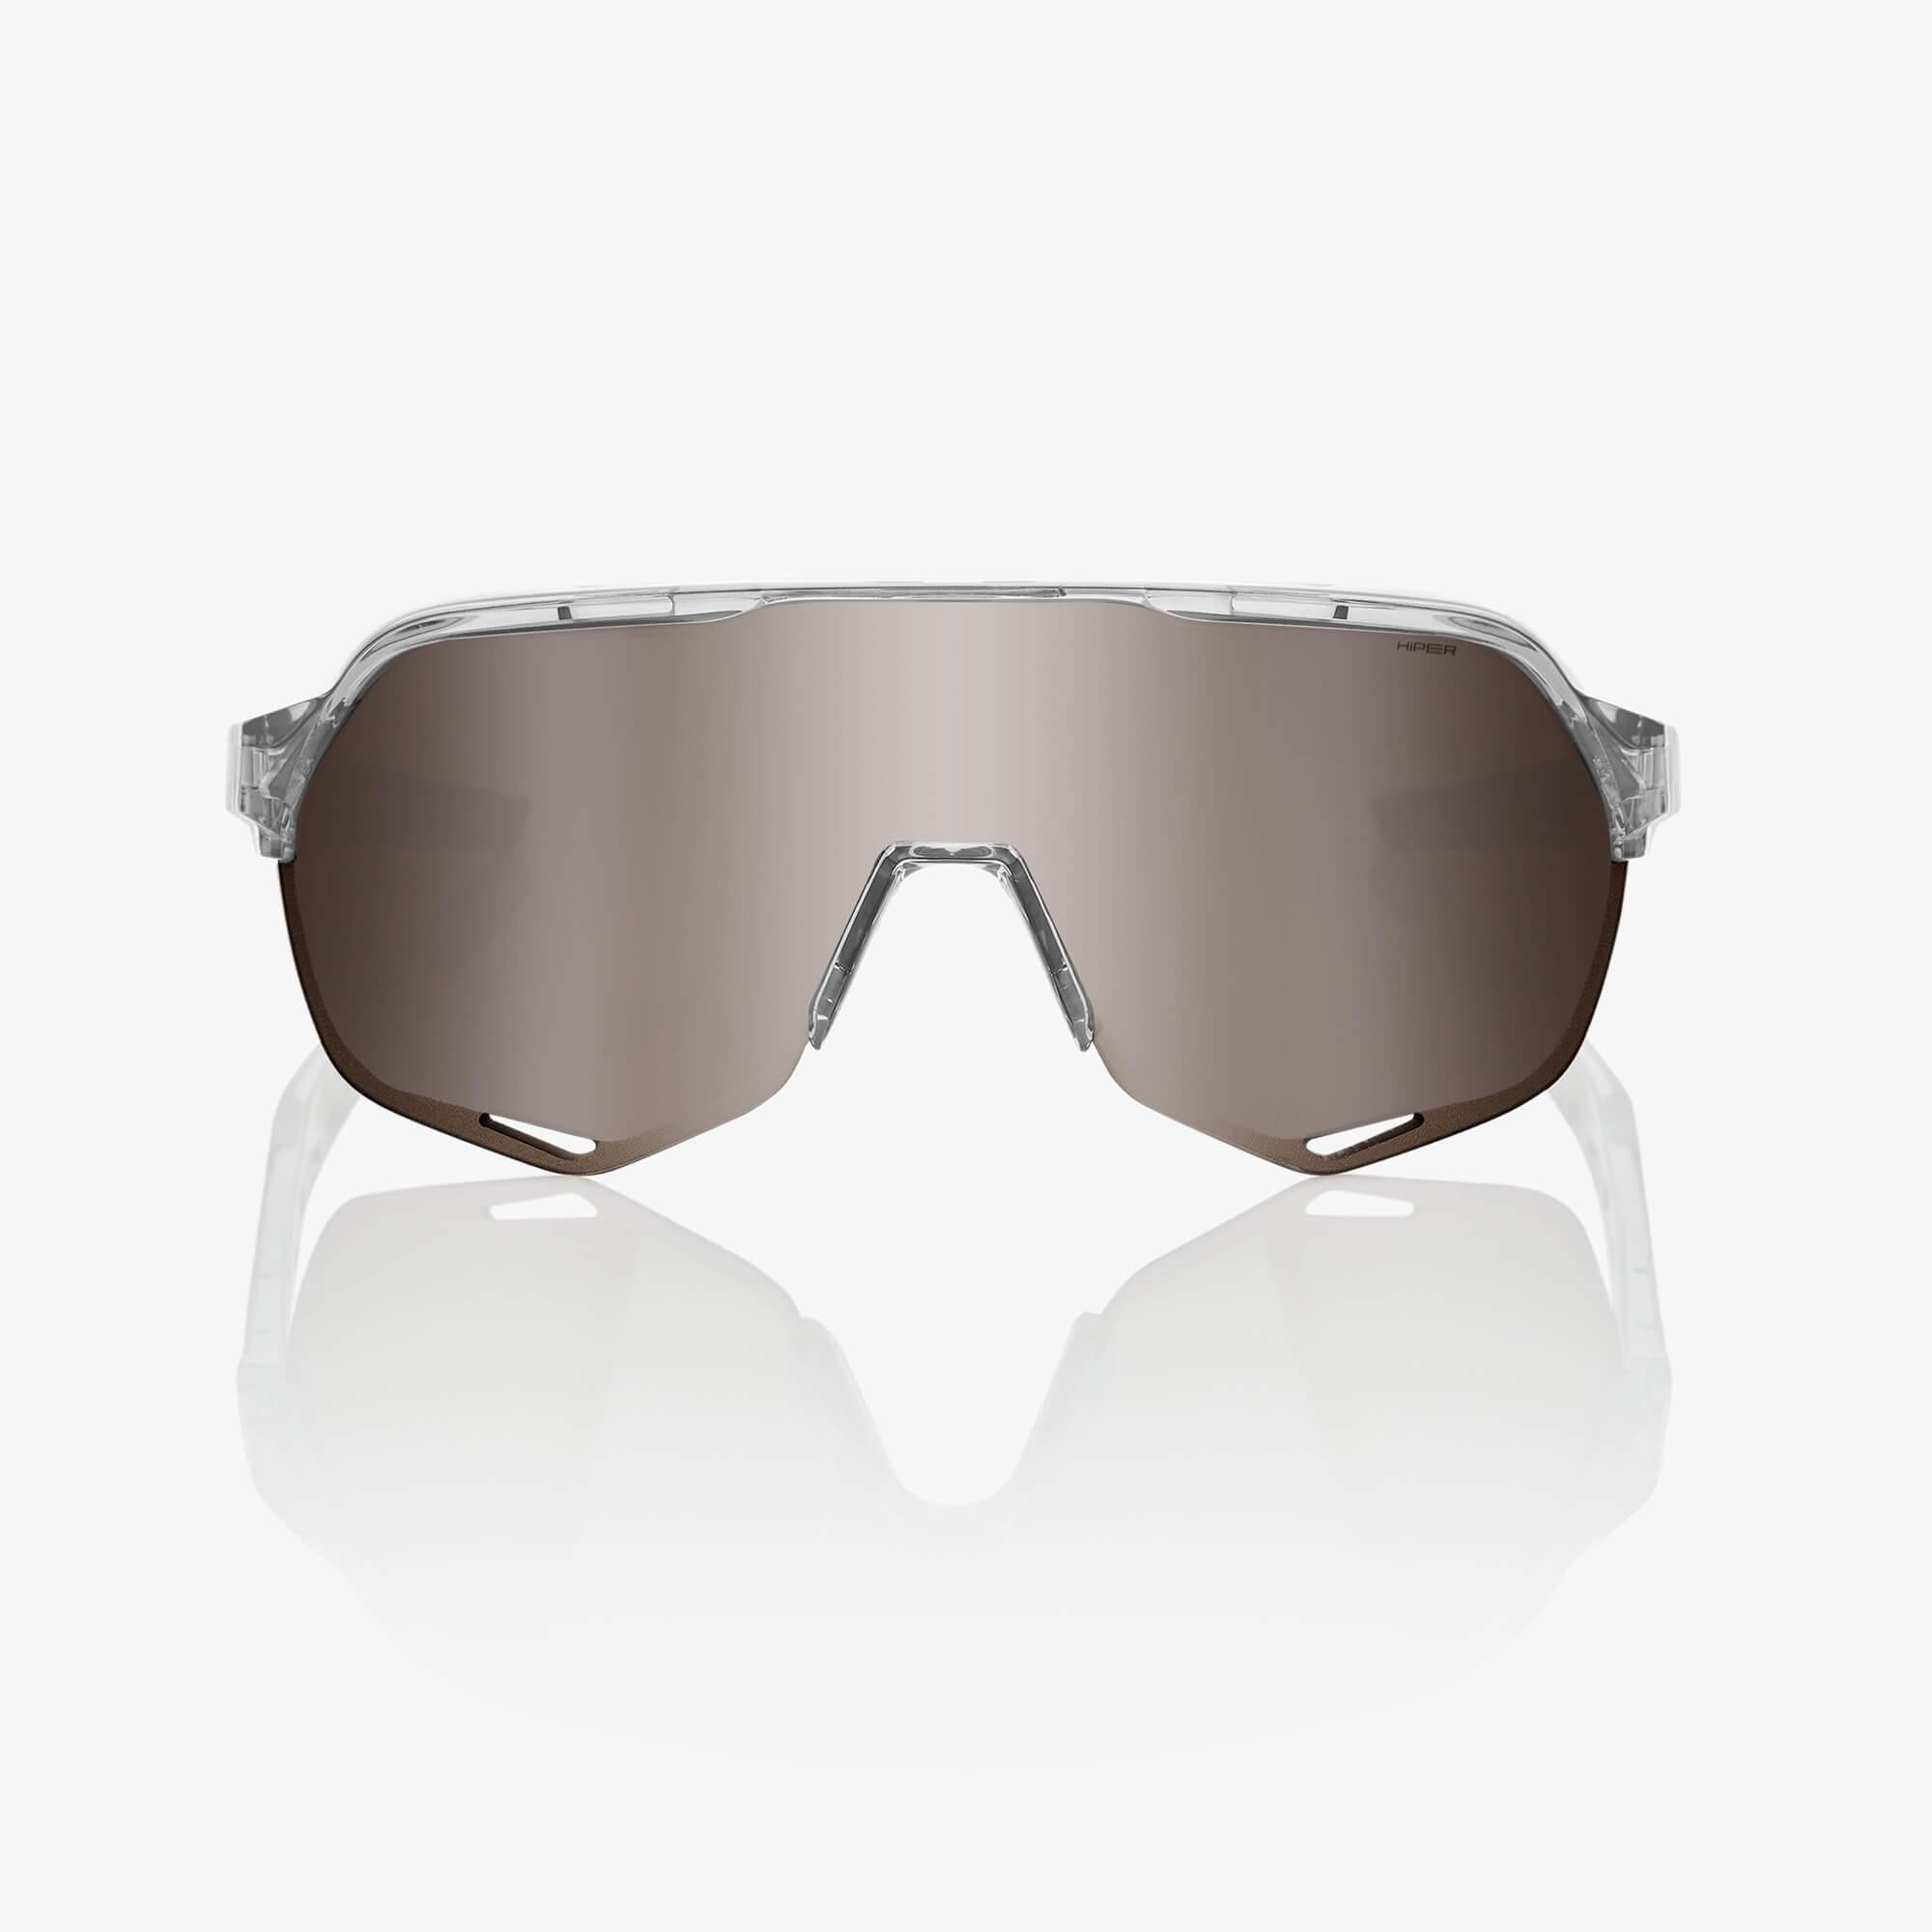 S2 – Polished Translucent Grey – HiPER Silver Mirror